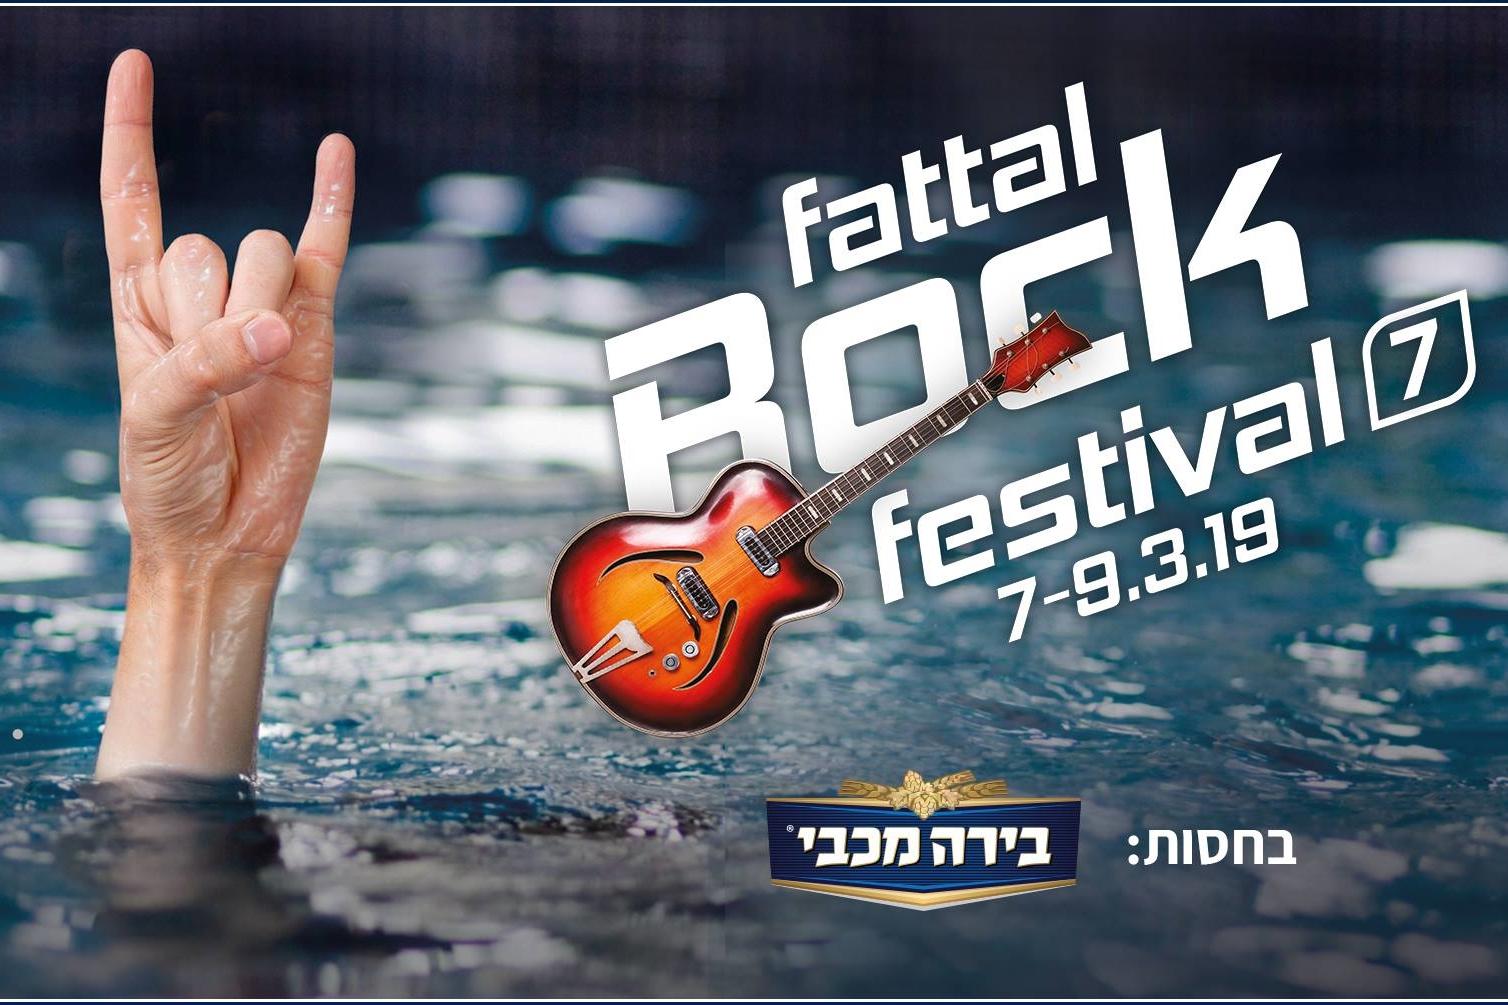 Fattal Rock Festival in Eilat, Israel. March 7-9, 2019